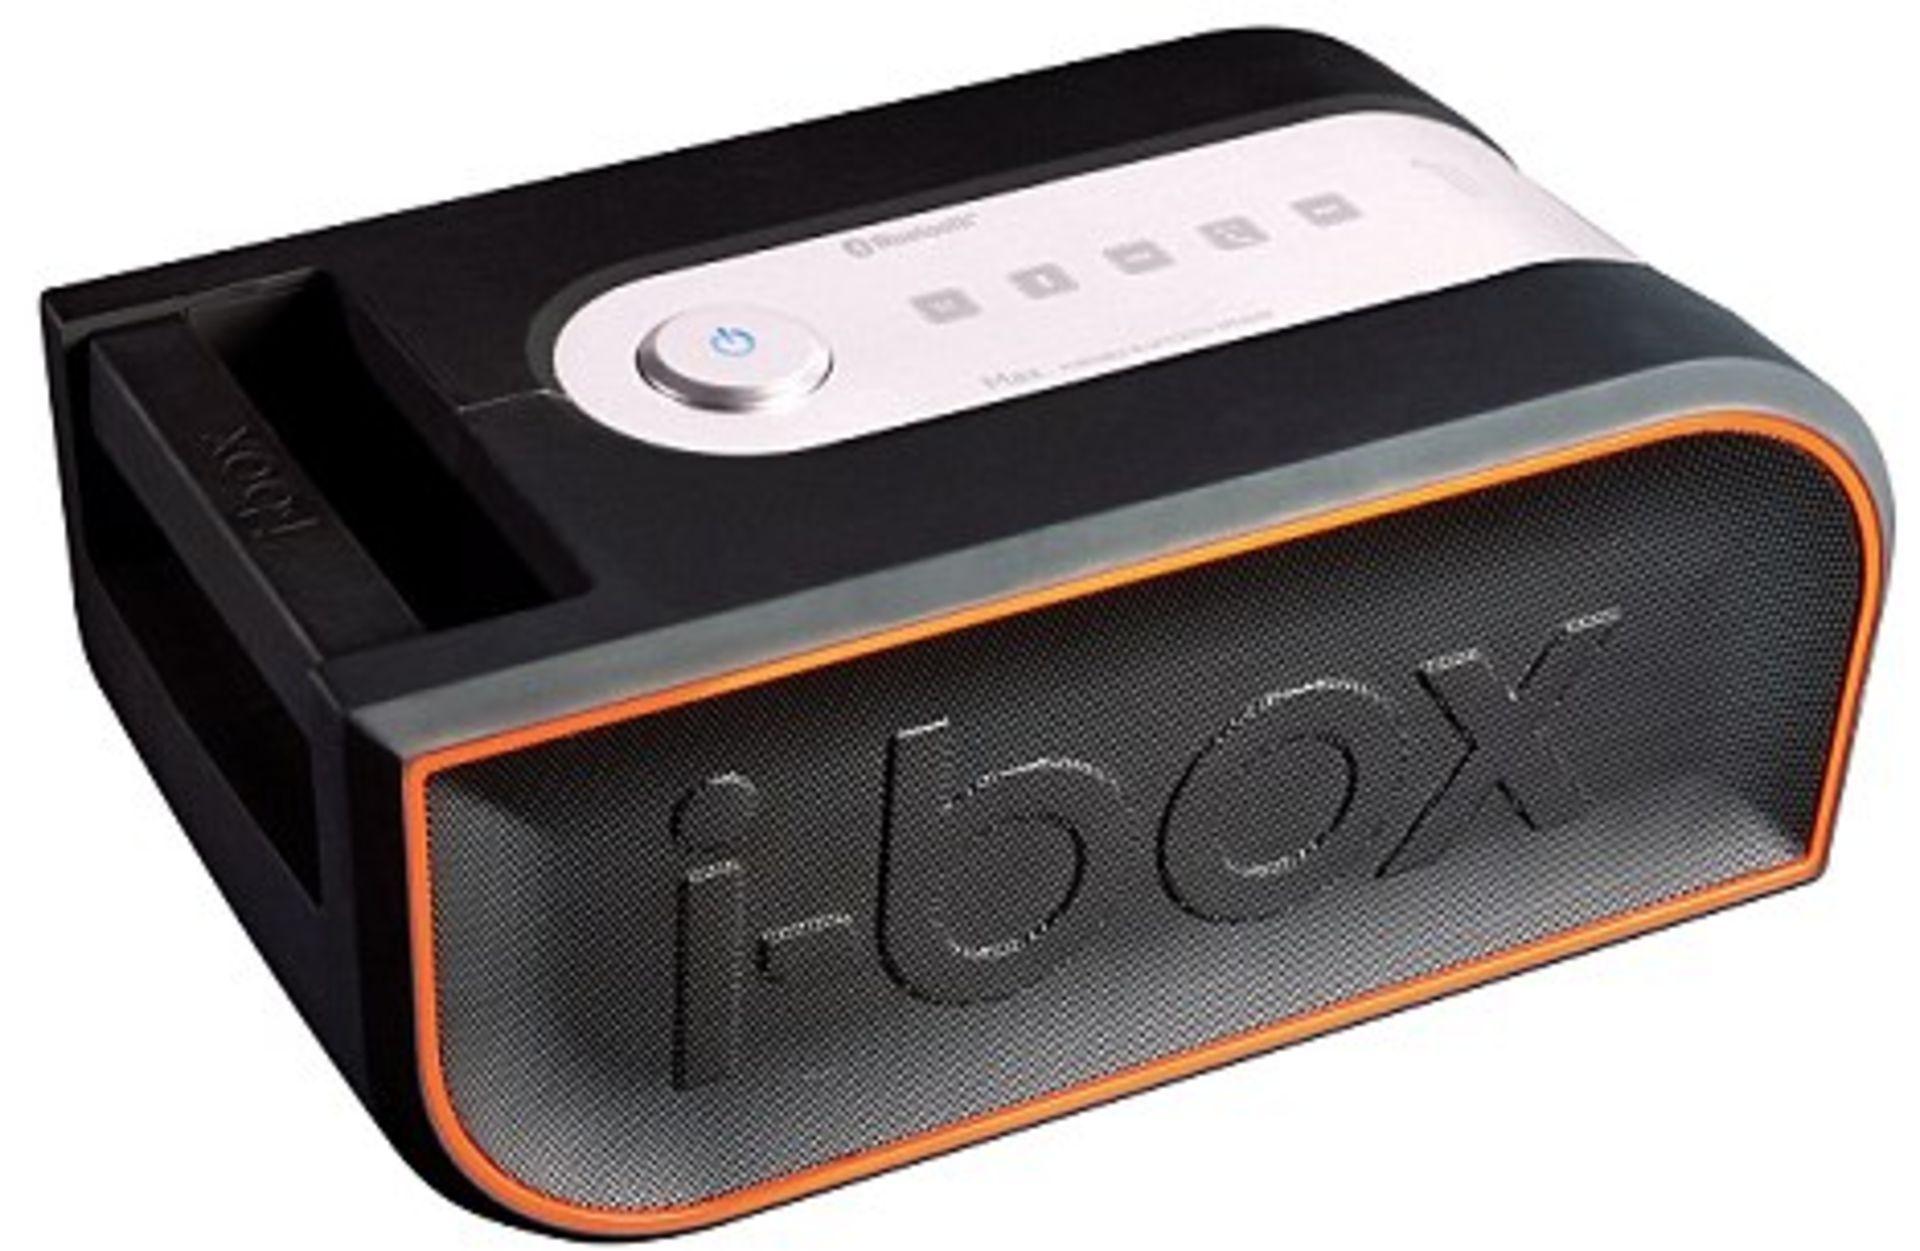 New - I-Box Max Performance Portable Bluetooth Sound System Rrp 148.99